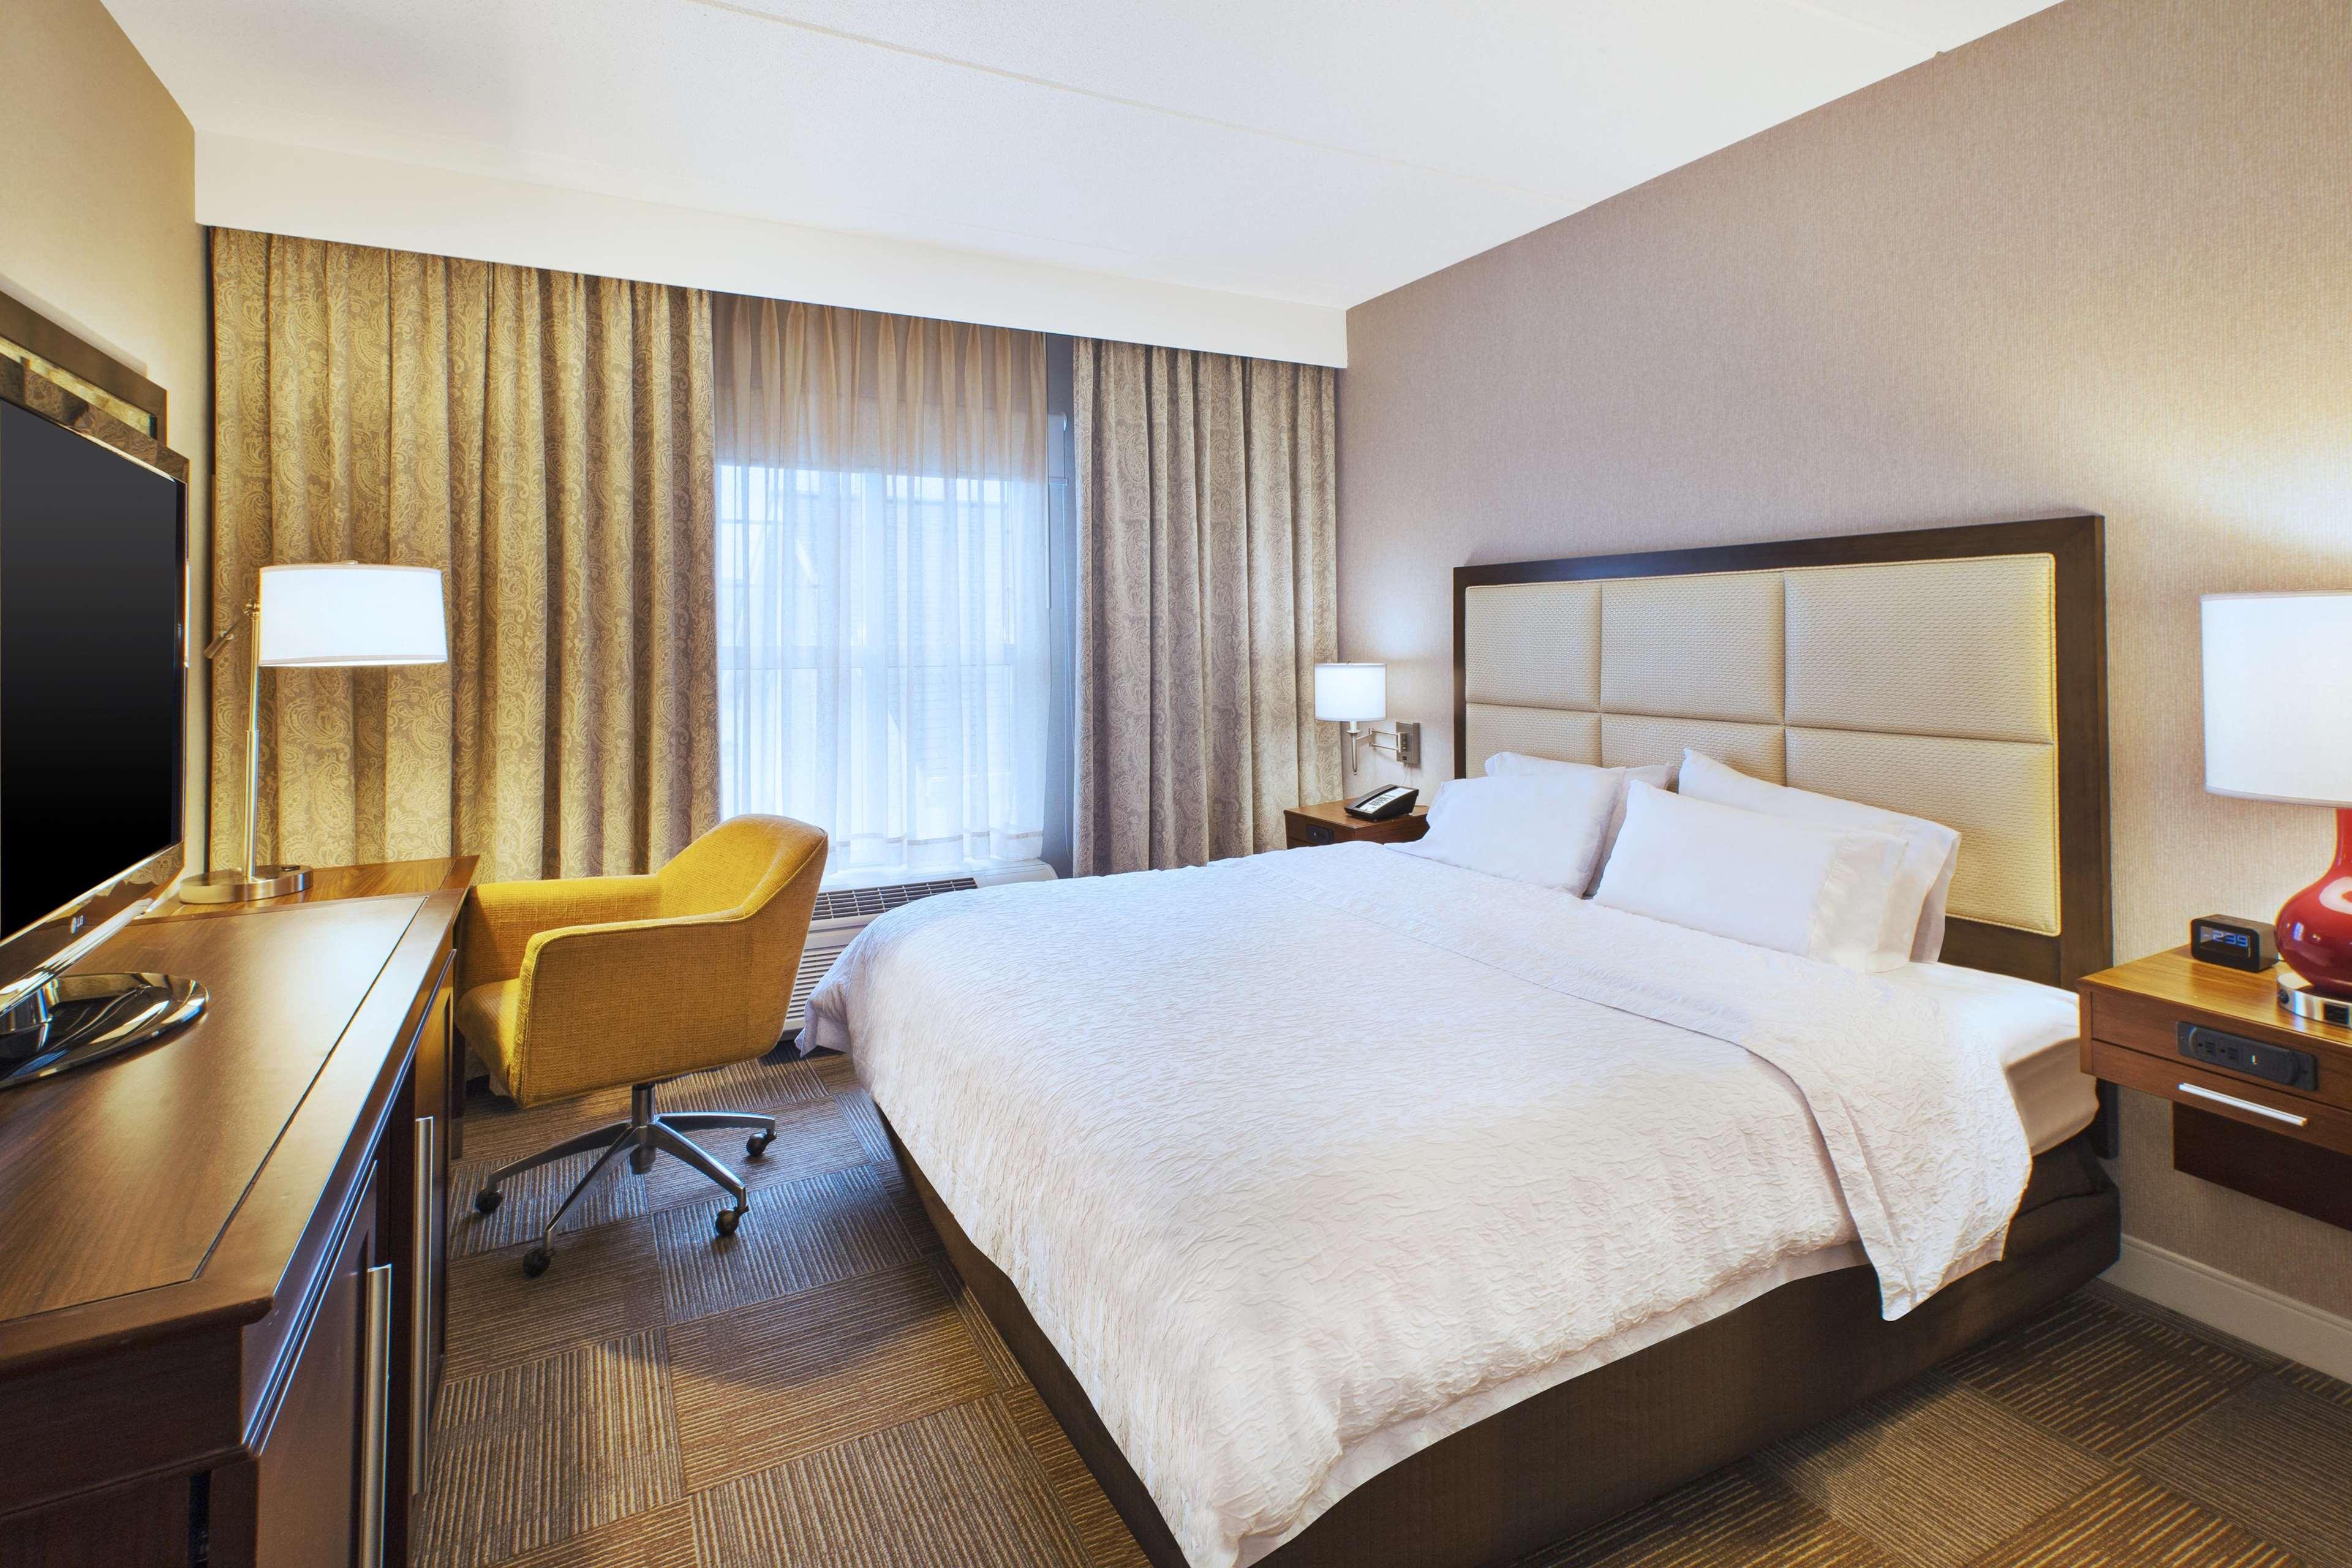 Hampton Inn & Suites Providence/Warwick-Airport image 45